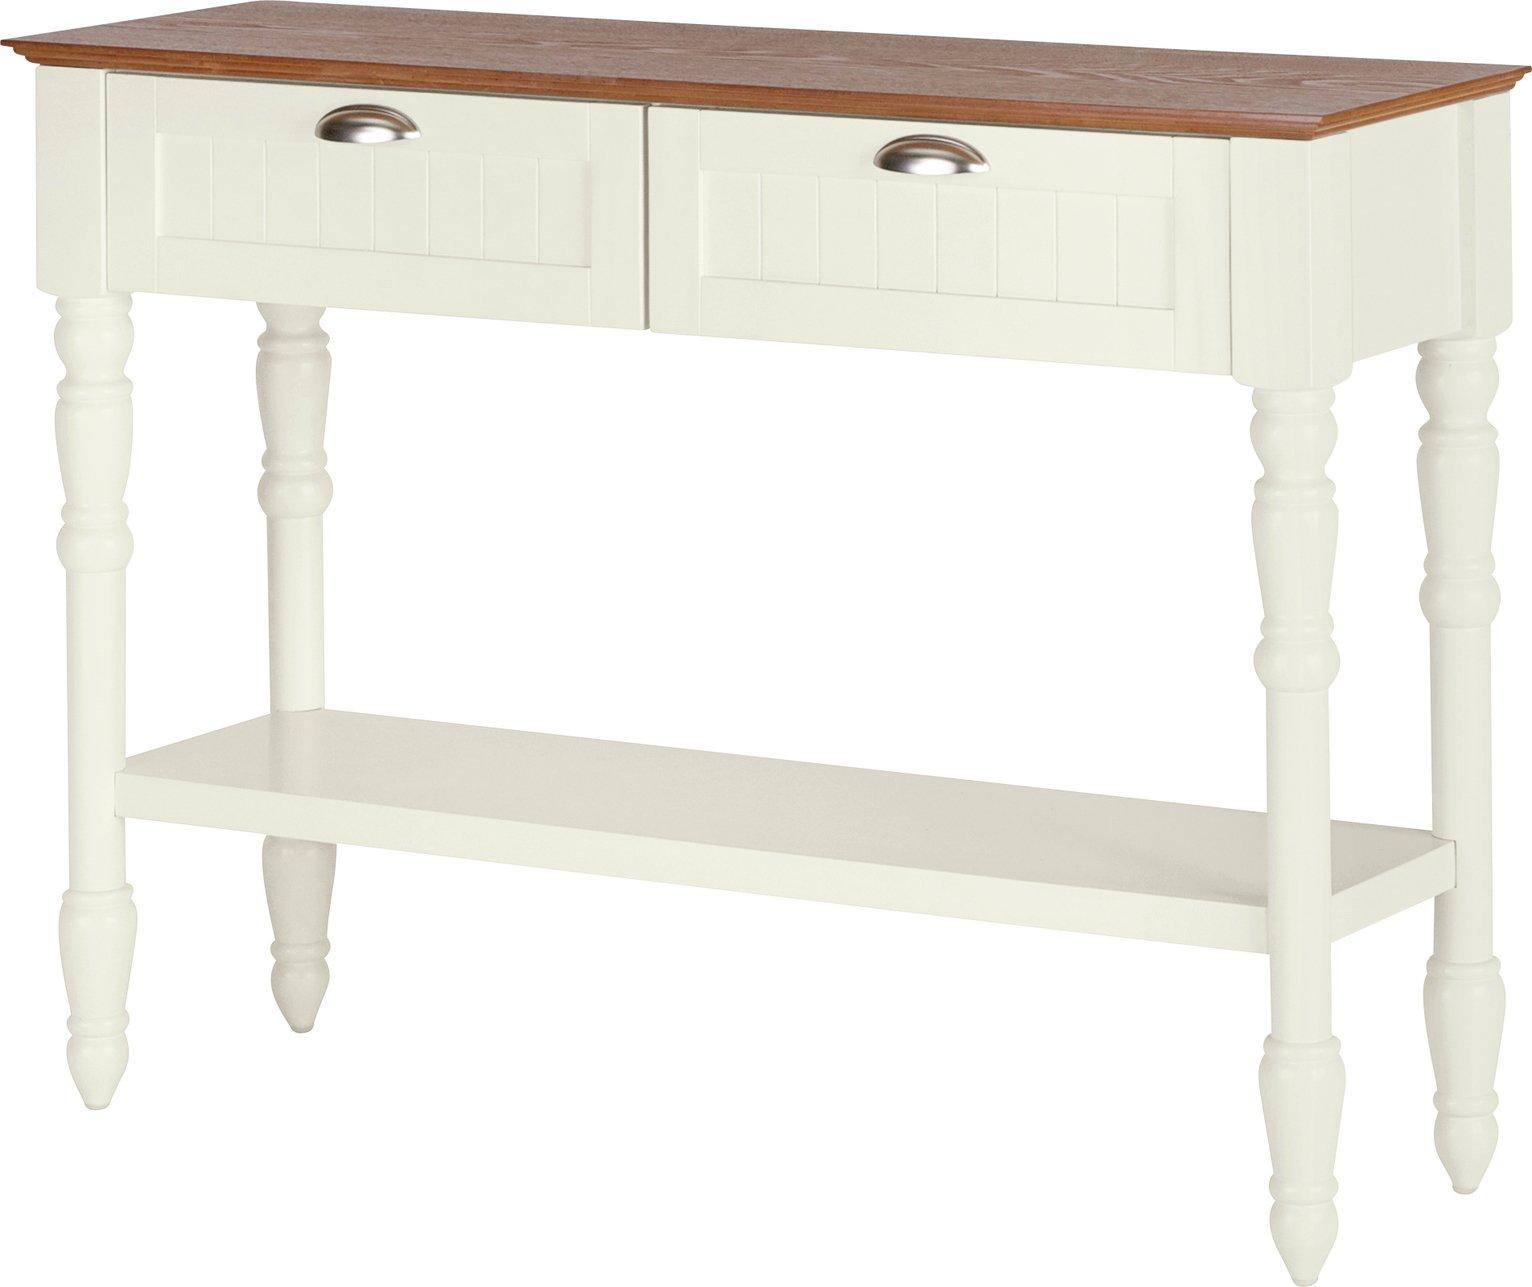 Argos Home Addington 2 Drw 1 Shelf Console Table - Two Tone